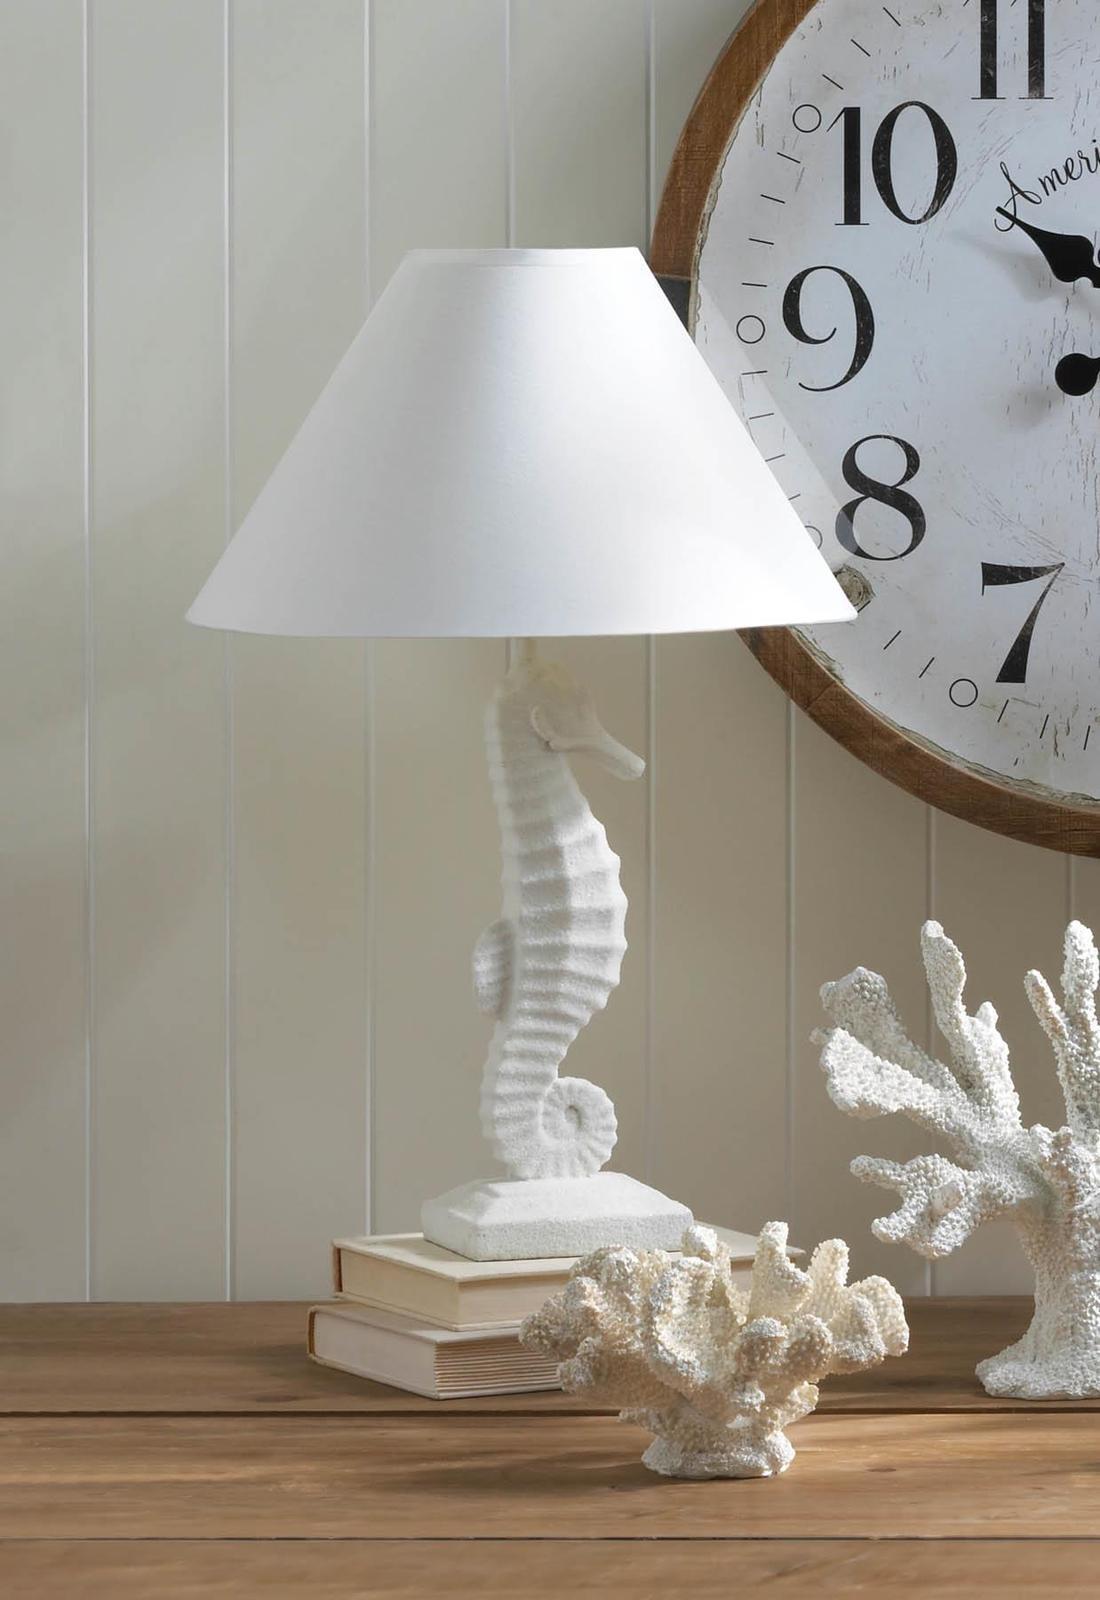 2 WHITE SEAHORSE Table Lamps Coastal Nautical Decor